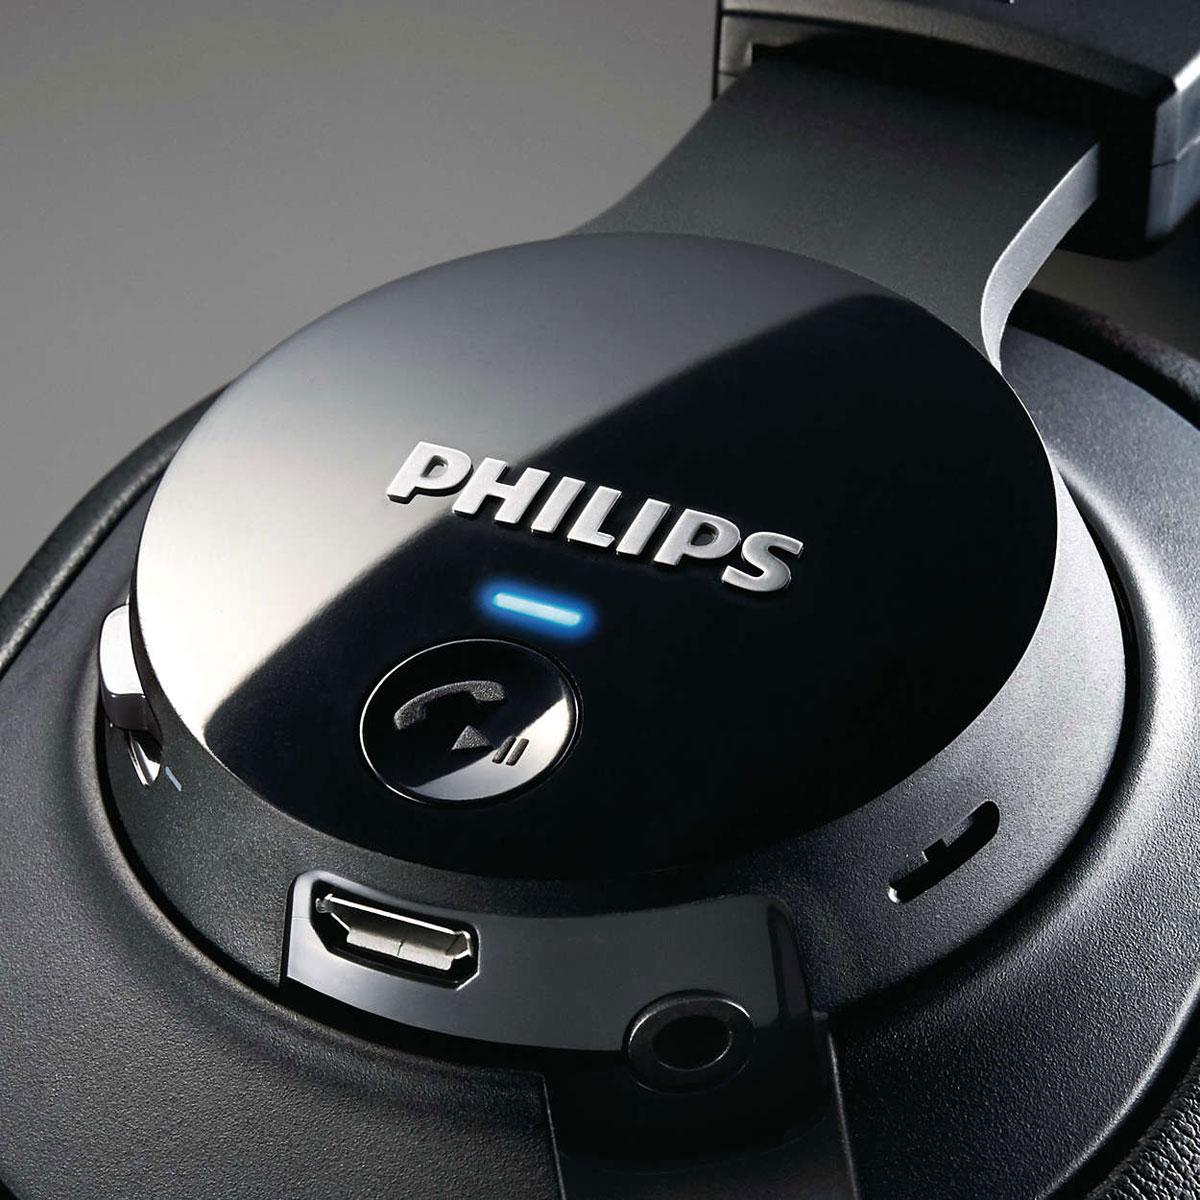 Philips Shb7150 Pas Cher Hardwarefr